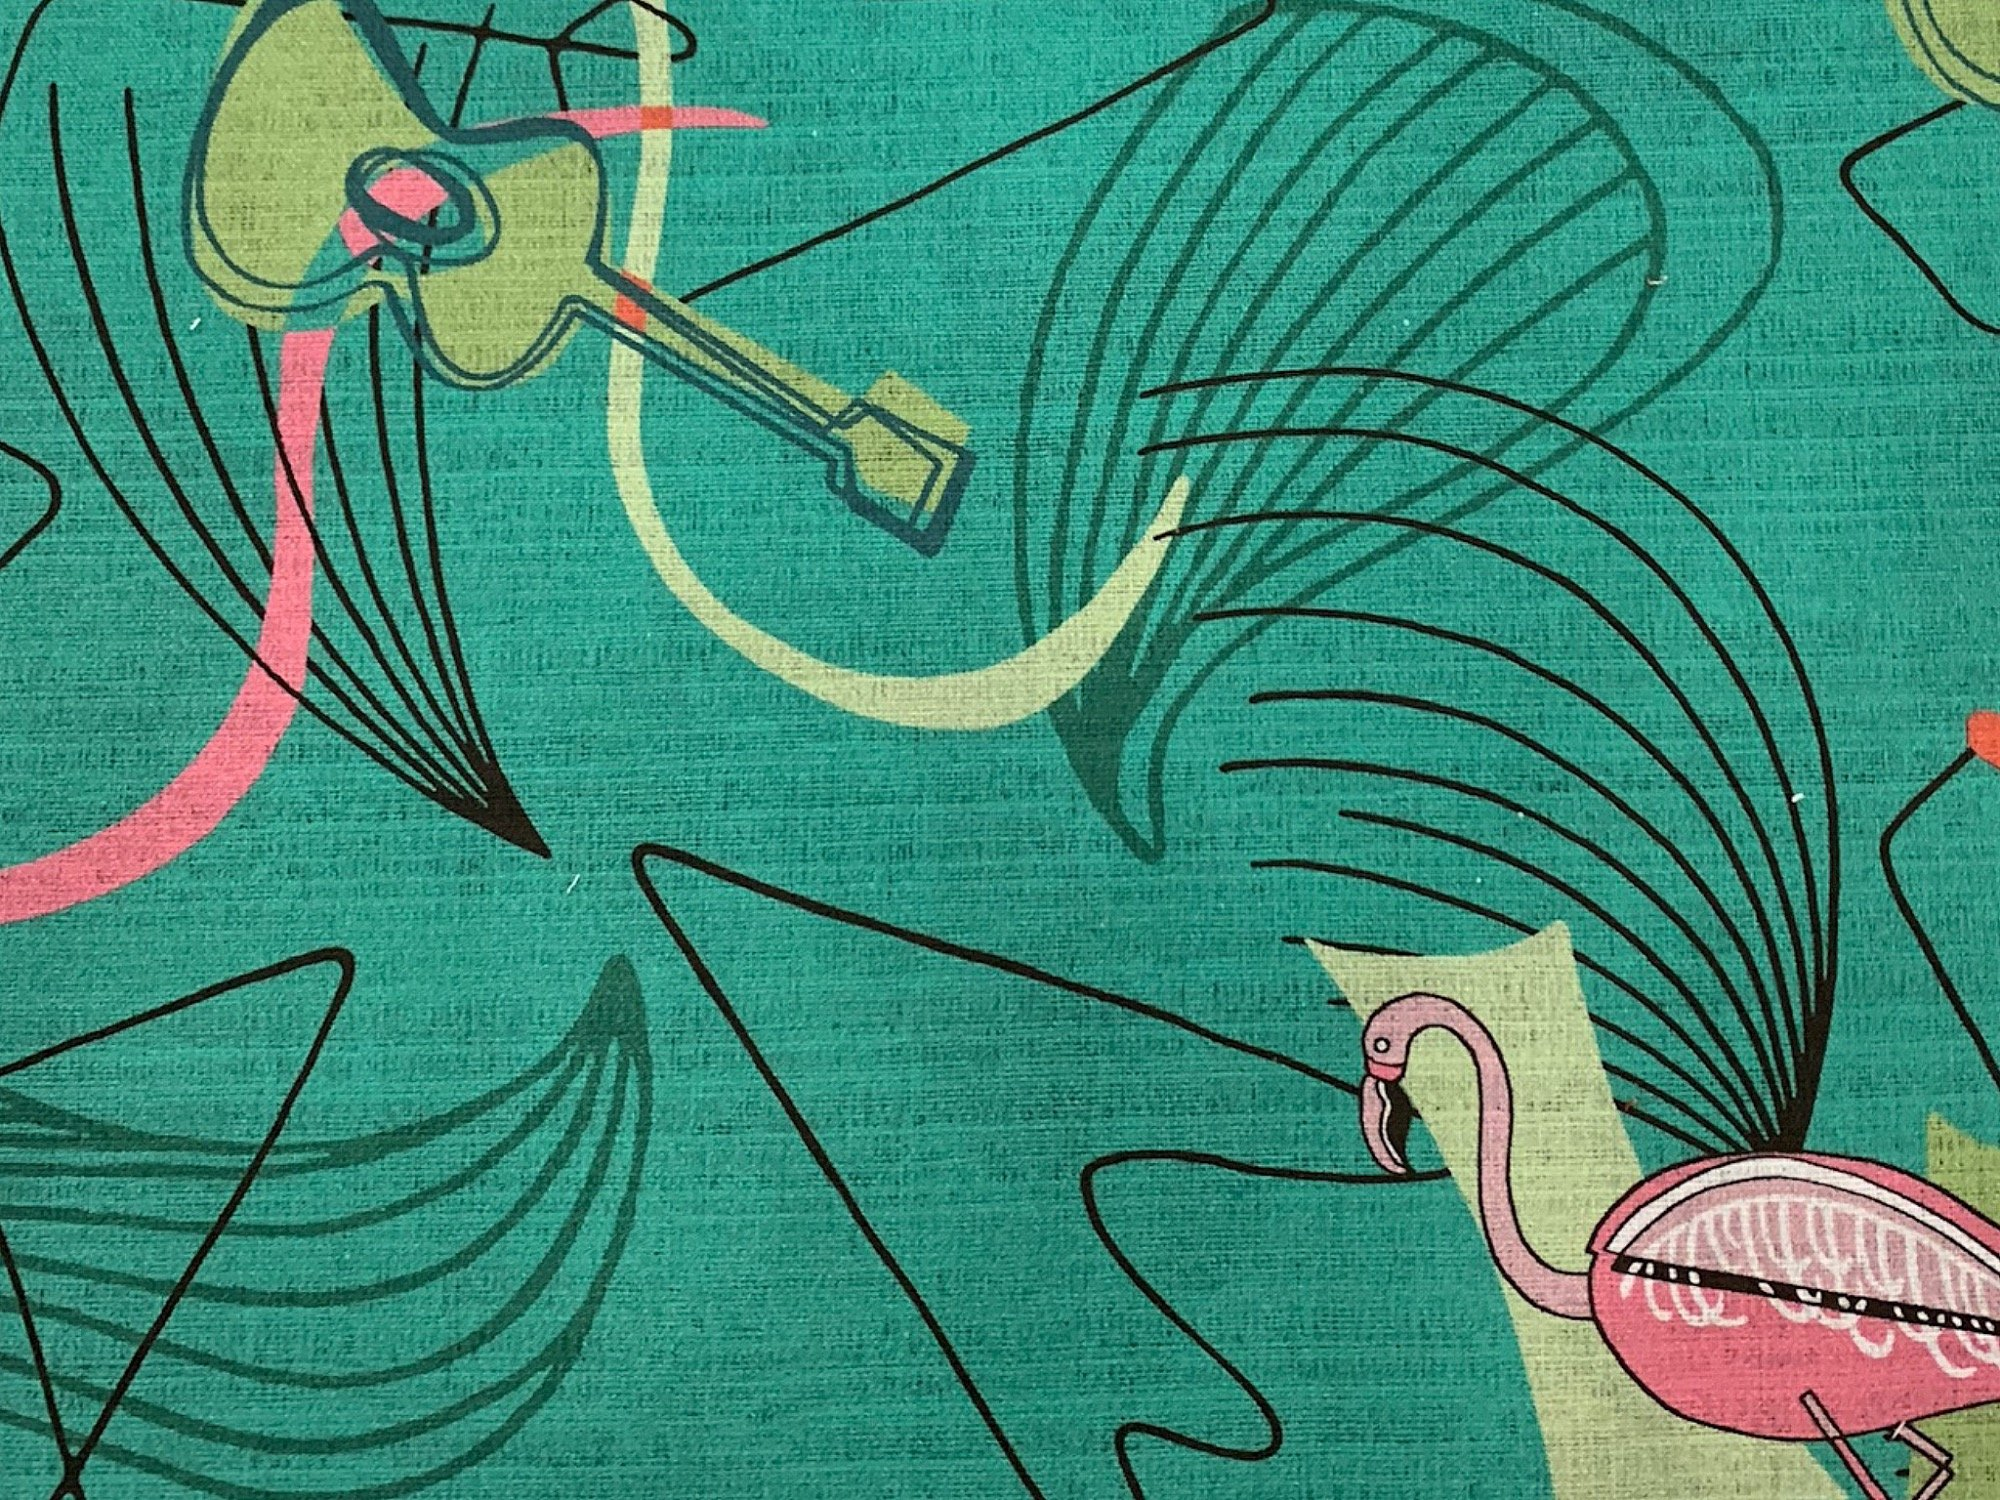 Coming Soon! Atomic Retro Mid Century Modern Flamingo Guitar Boomerang Sputnik Space Age MCM Cotton Fabric Light Weight Canvas